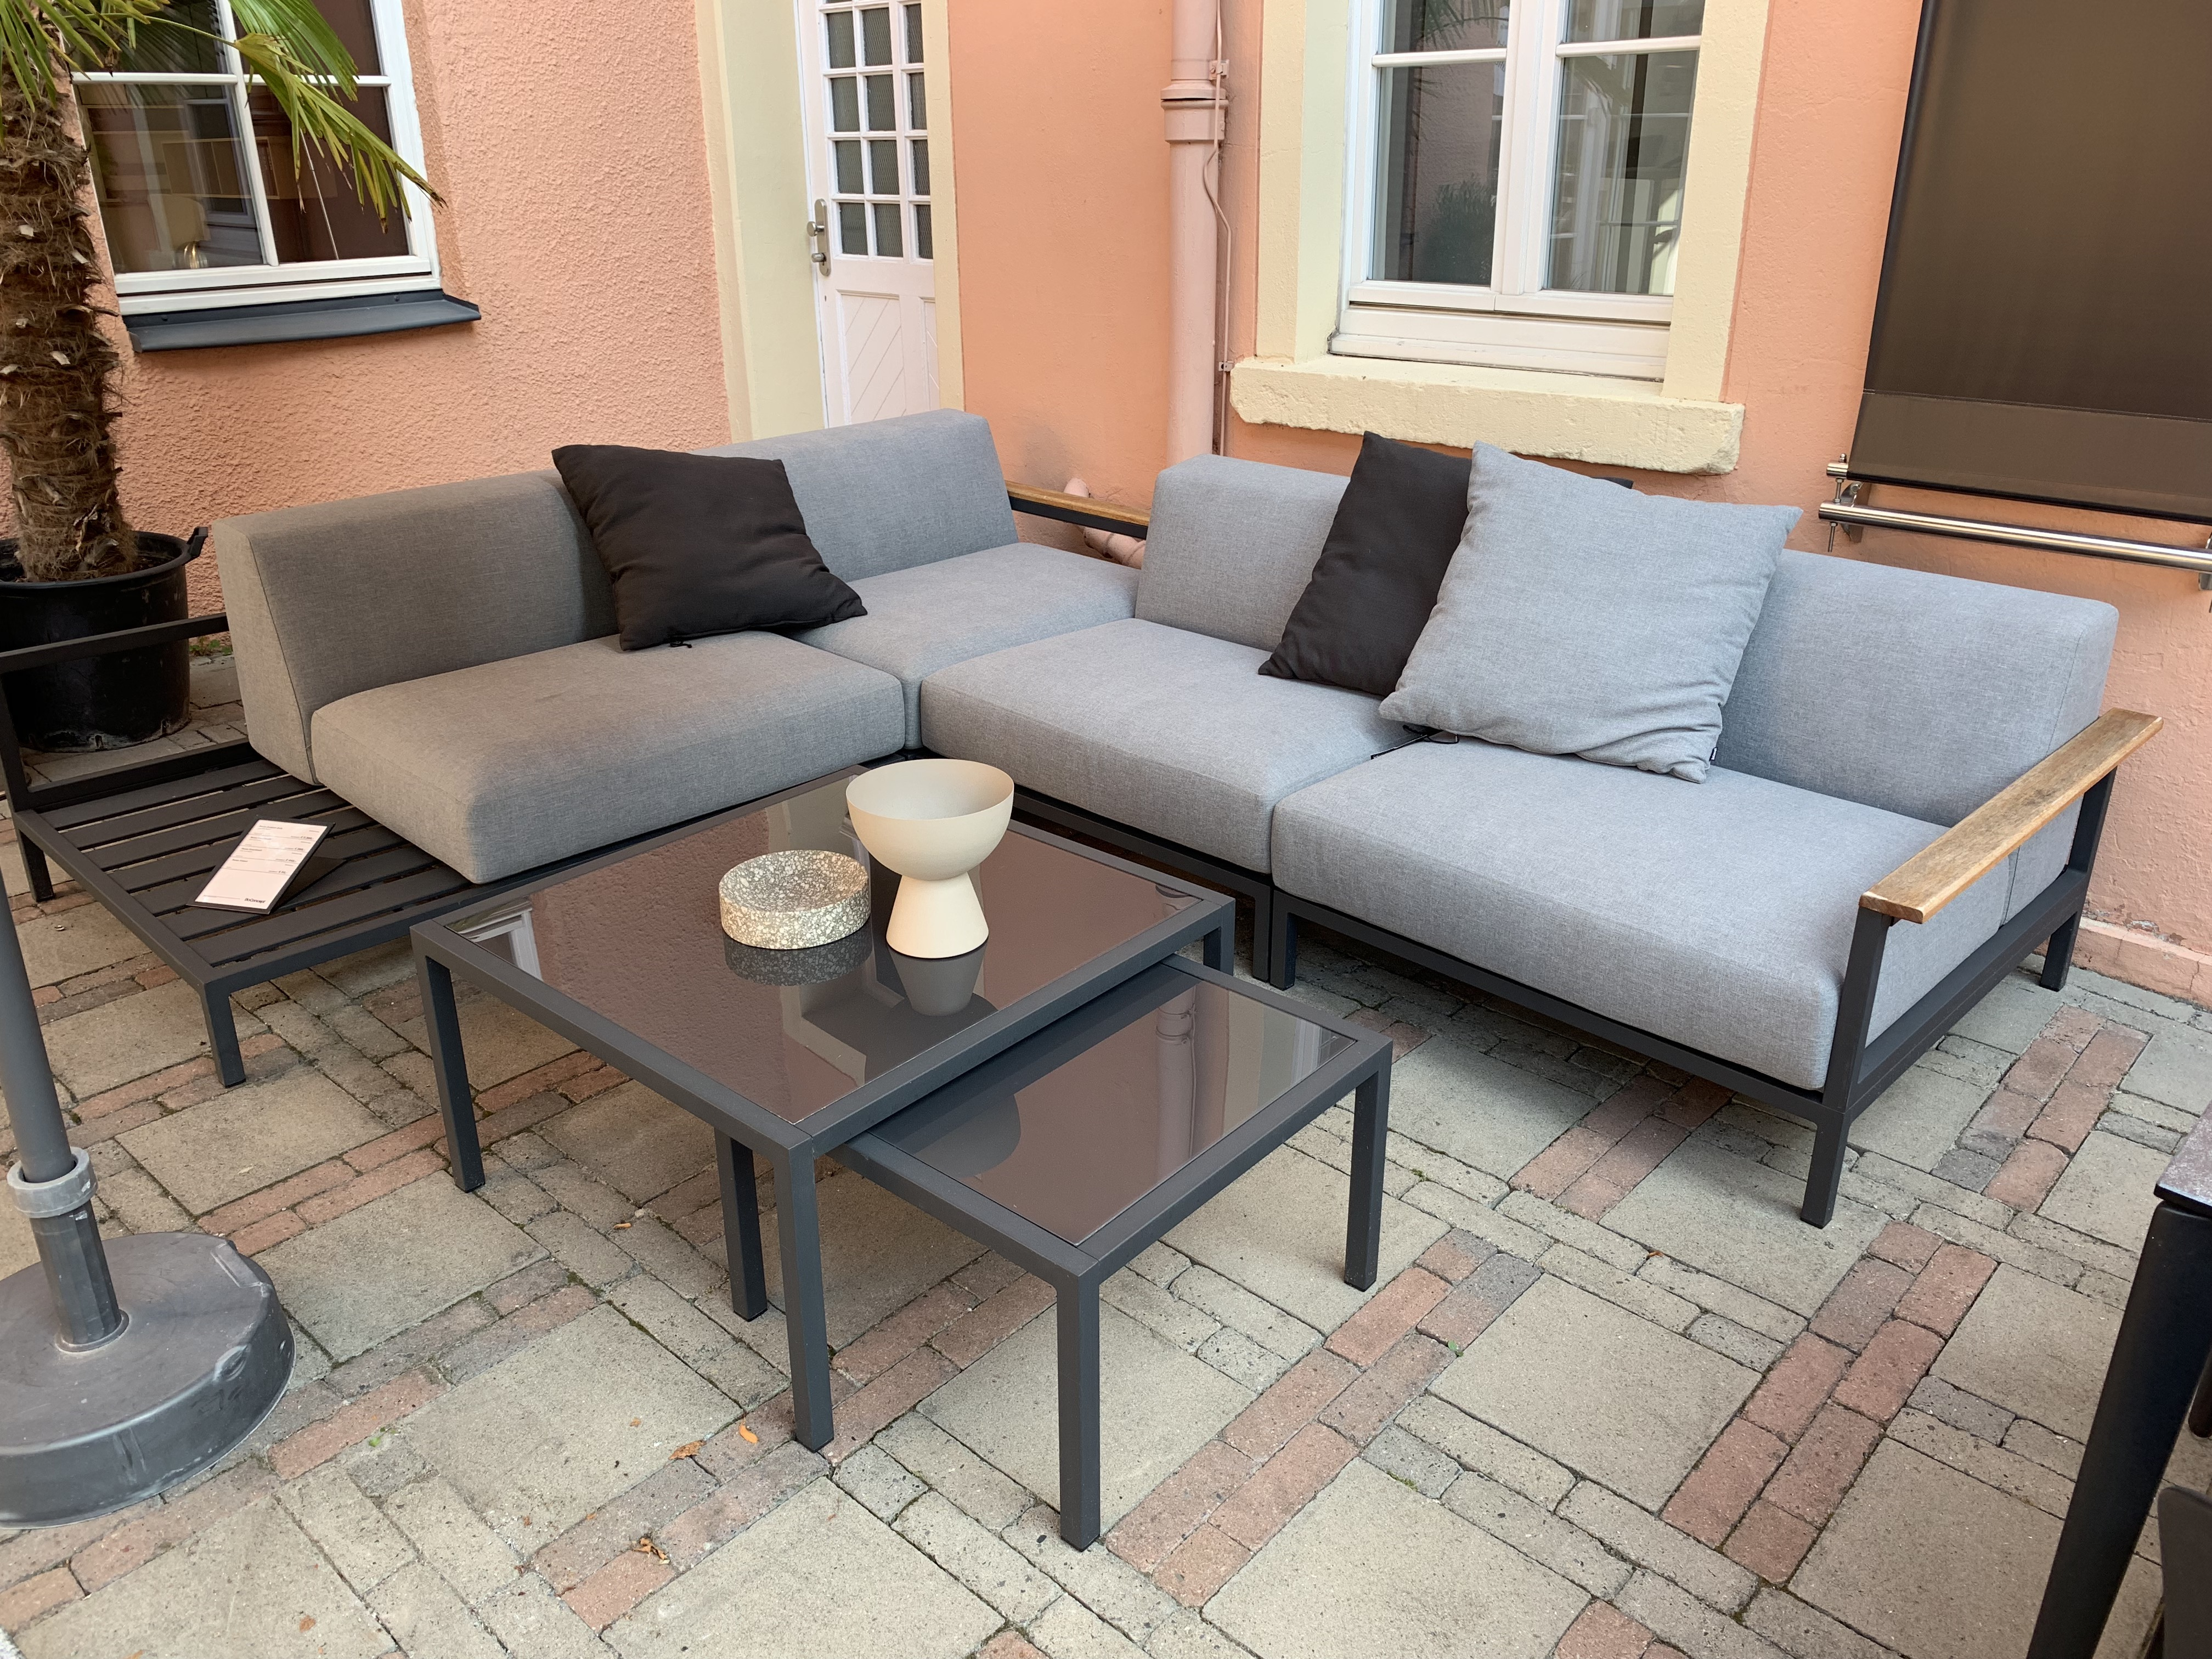 Paket ROME Outdoor Lounge Sofa